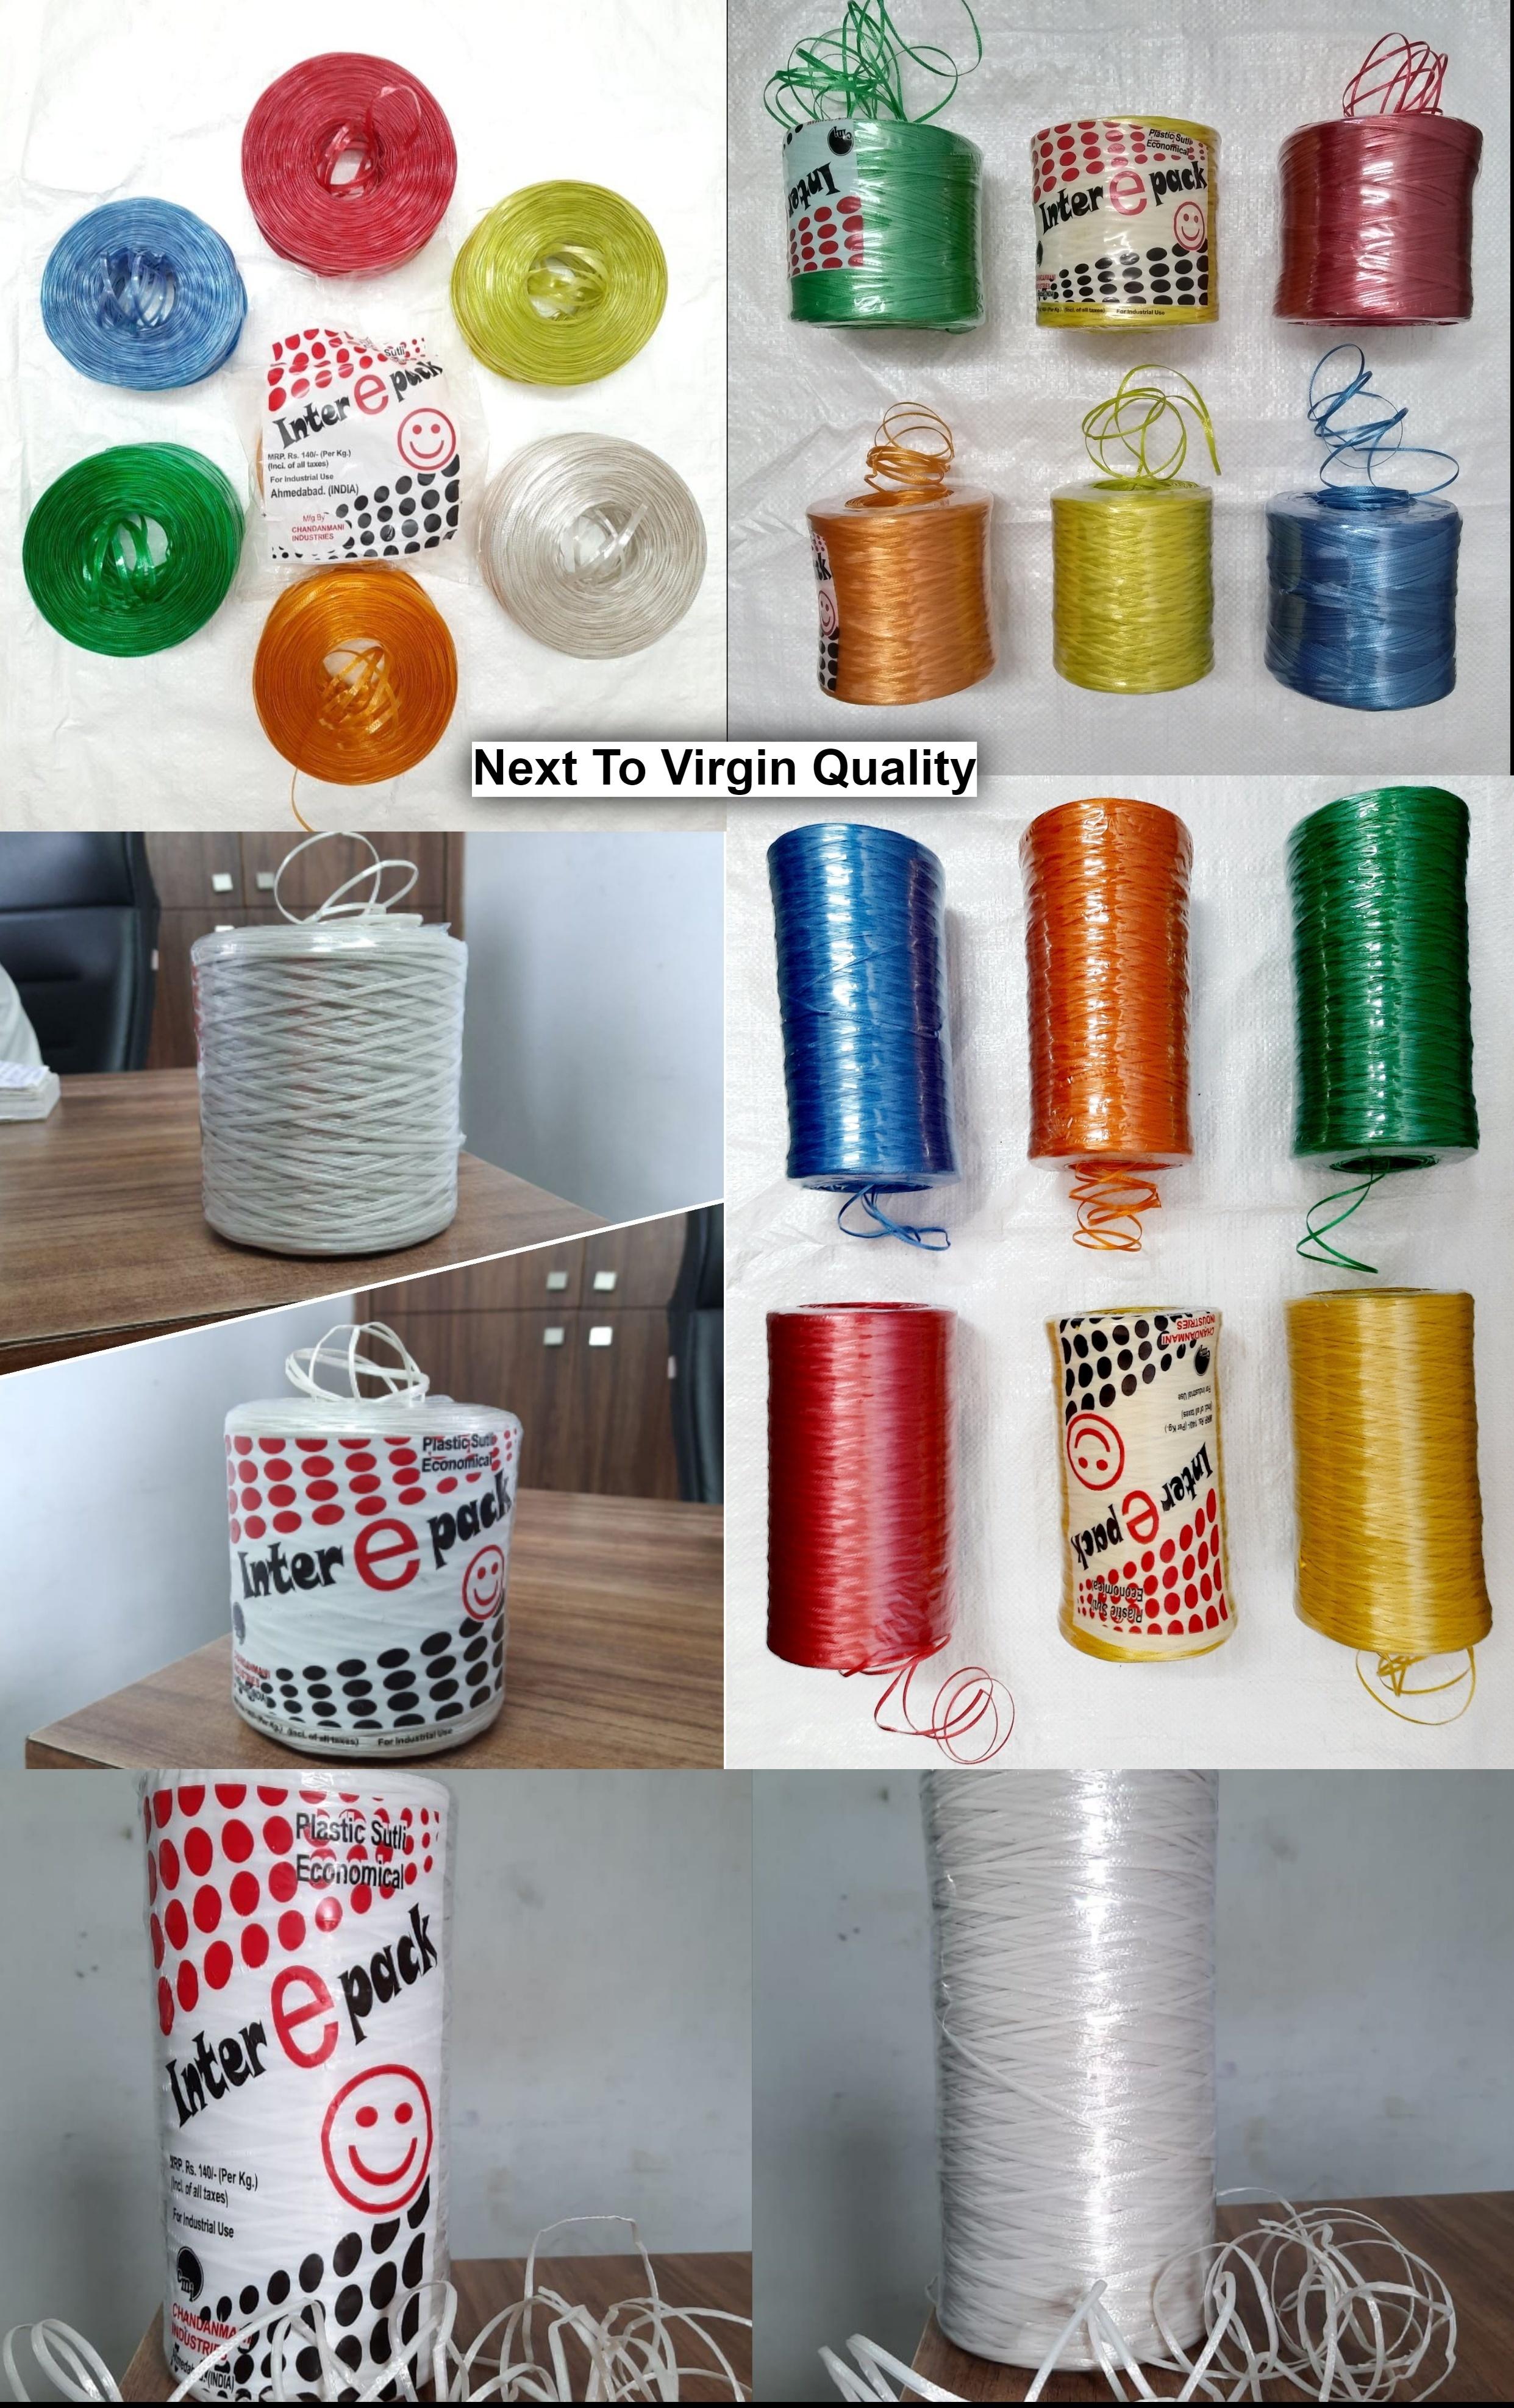 Plastic Sutli (Next to Virgin Quality)